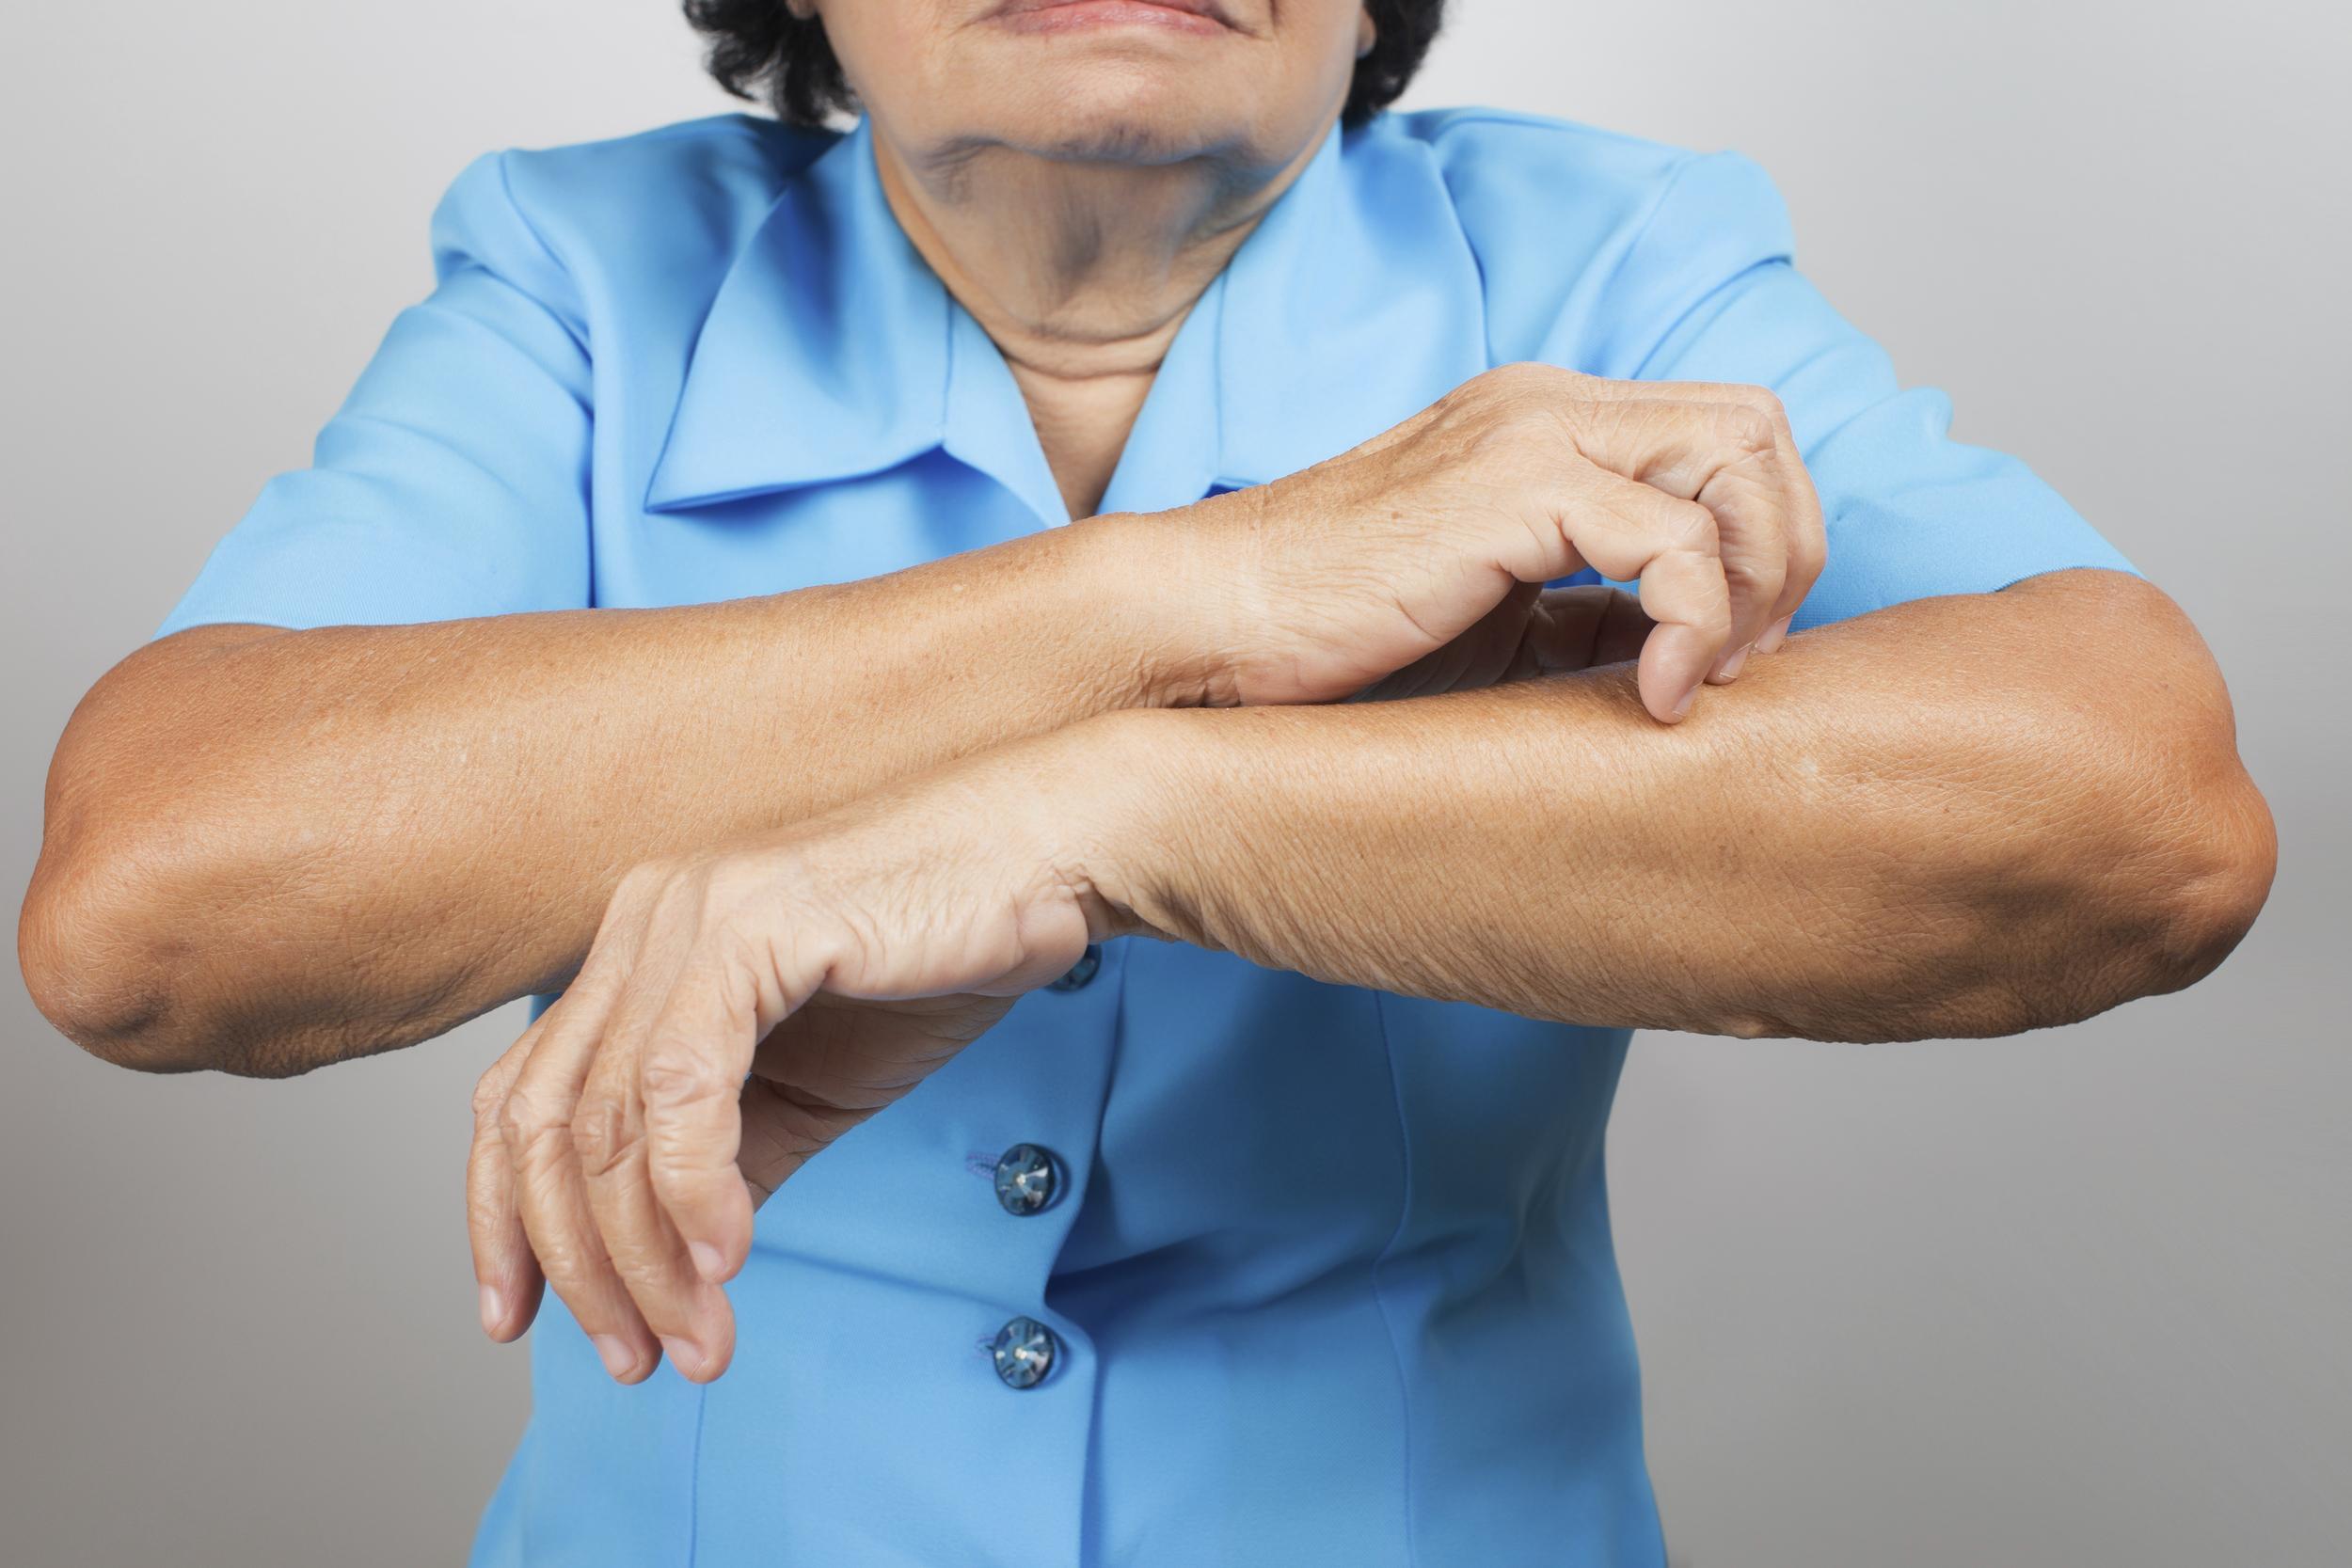 remedy-your-skin-oxford-healthcare-home-care-tulsa-oklahoma